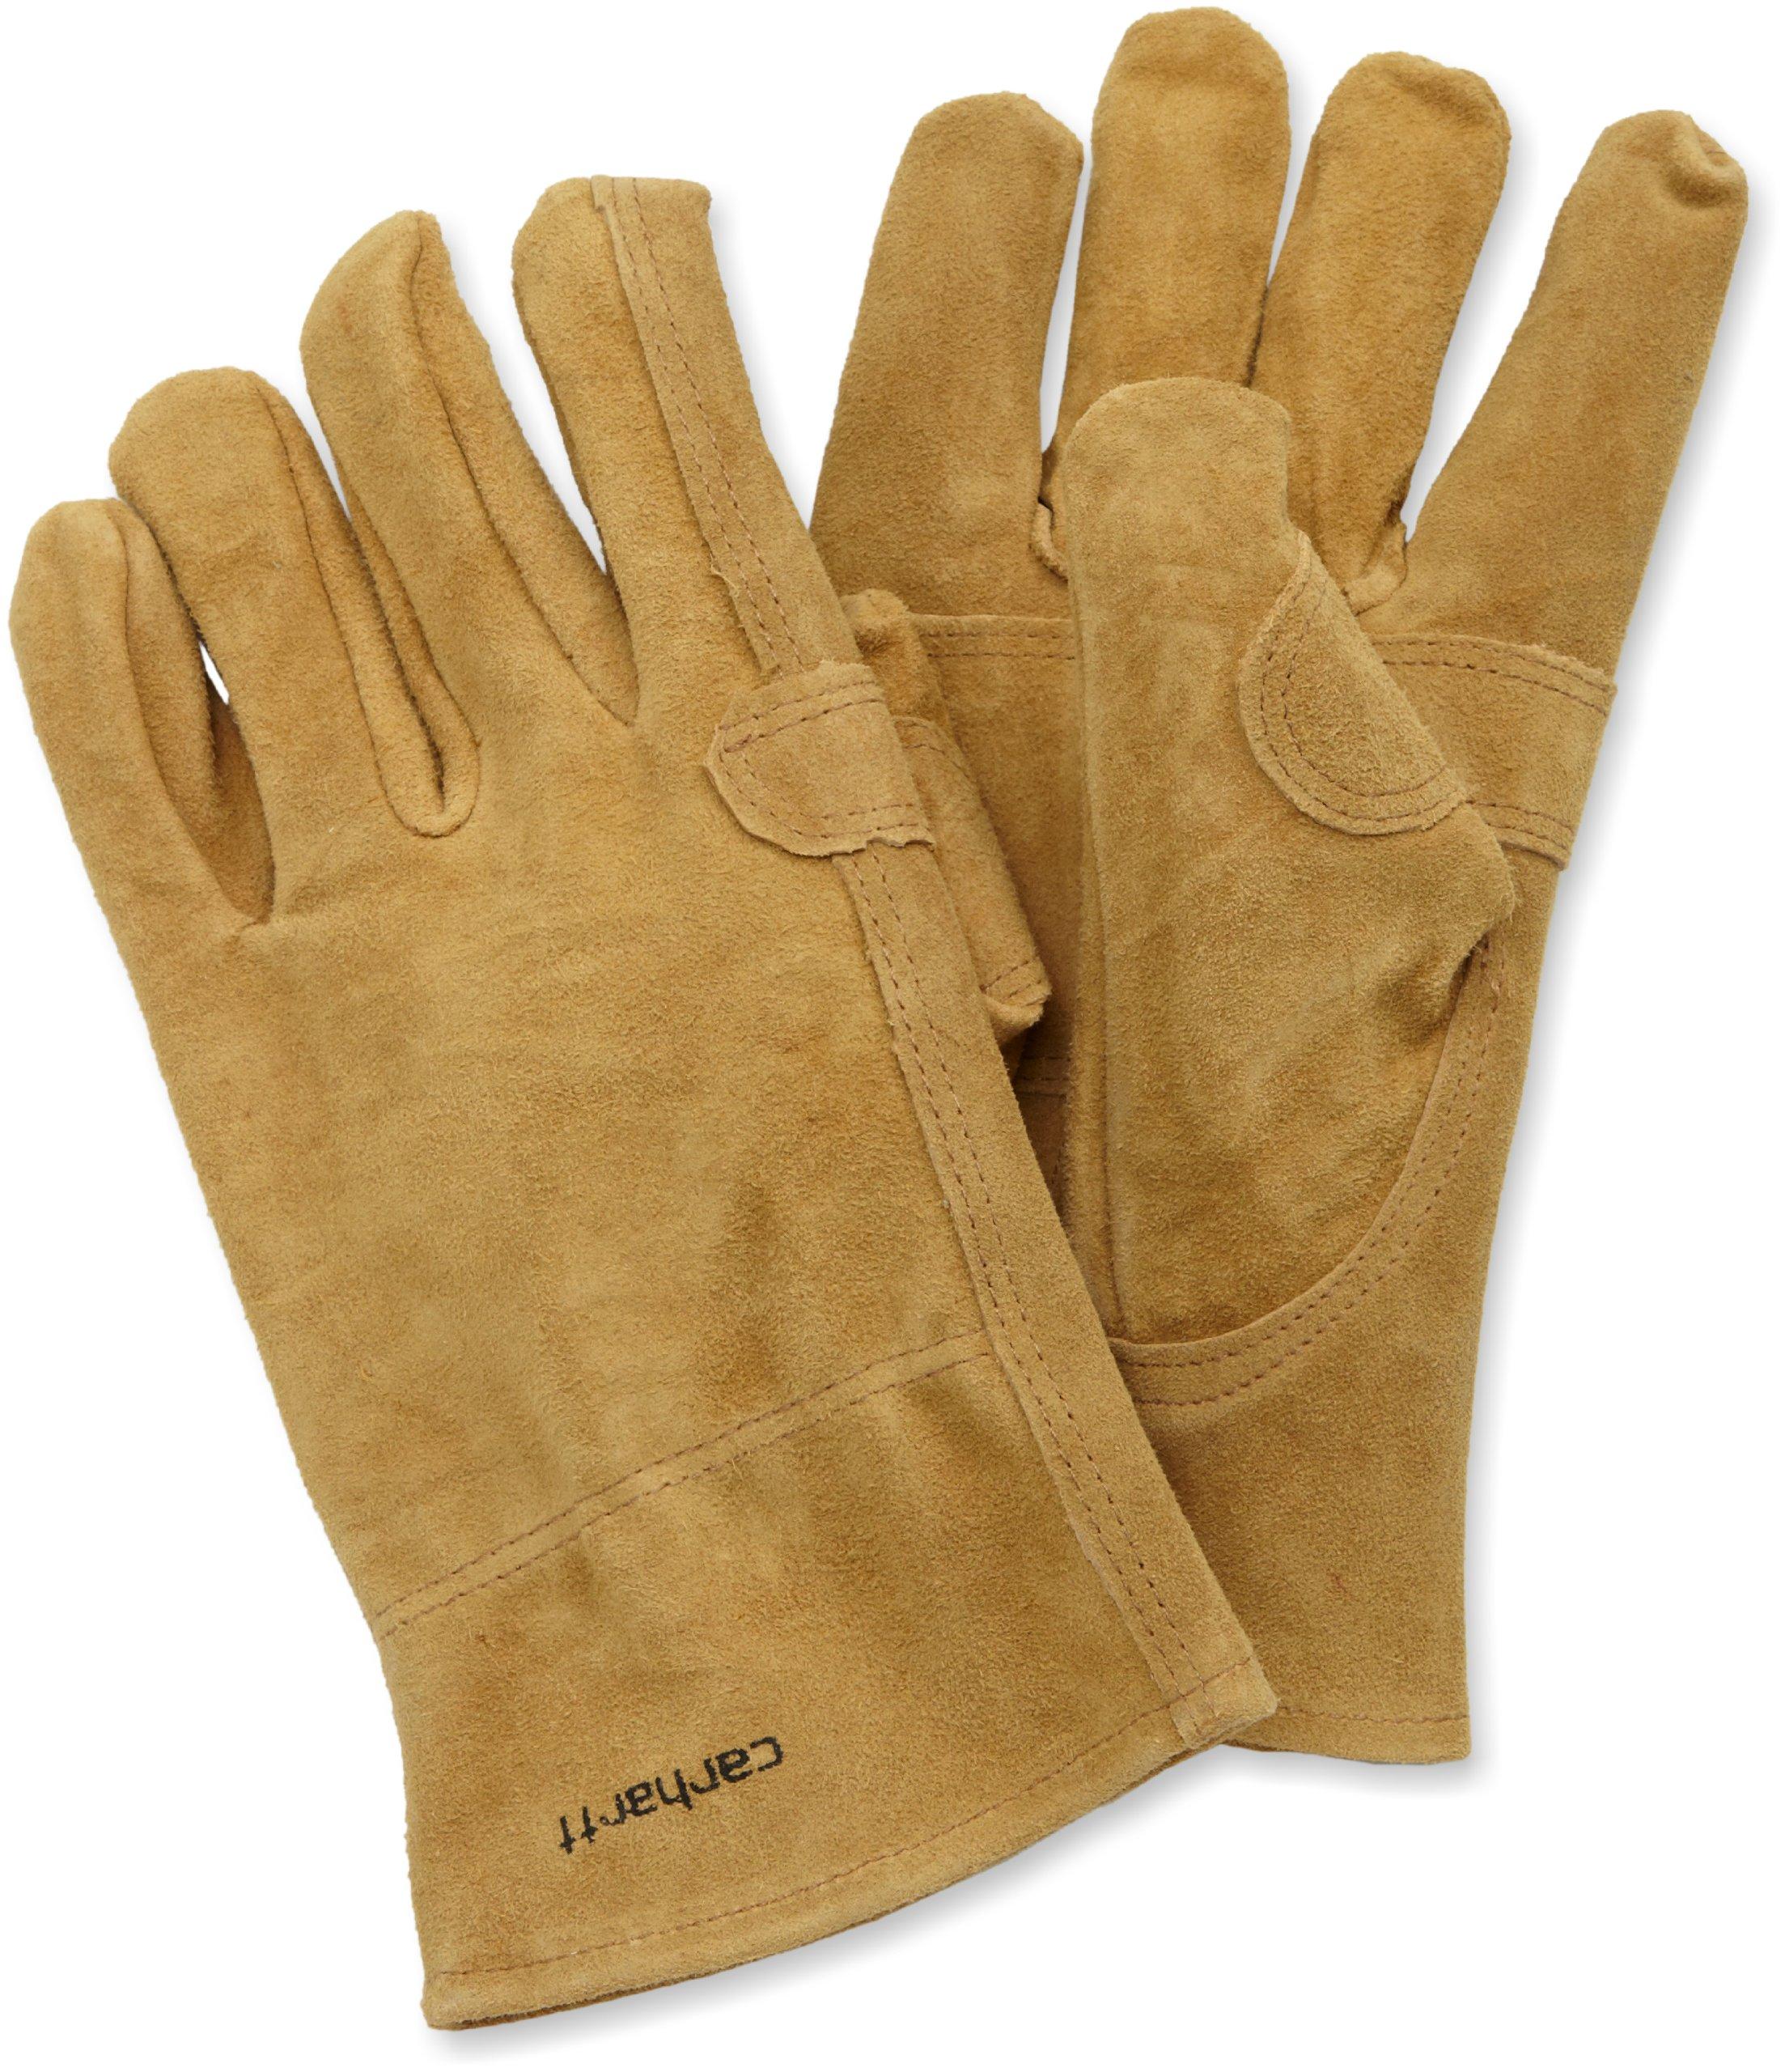 Carhartt Men's Leather Fencer Work Glove, Brown, XX-Large